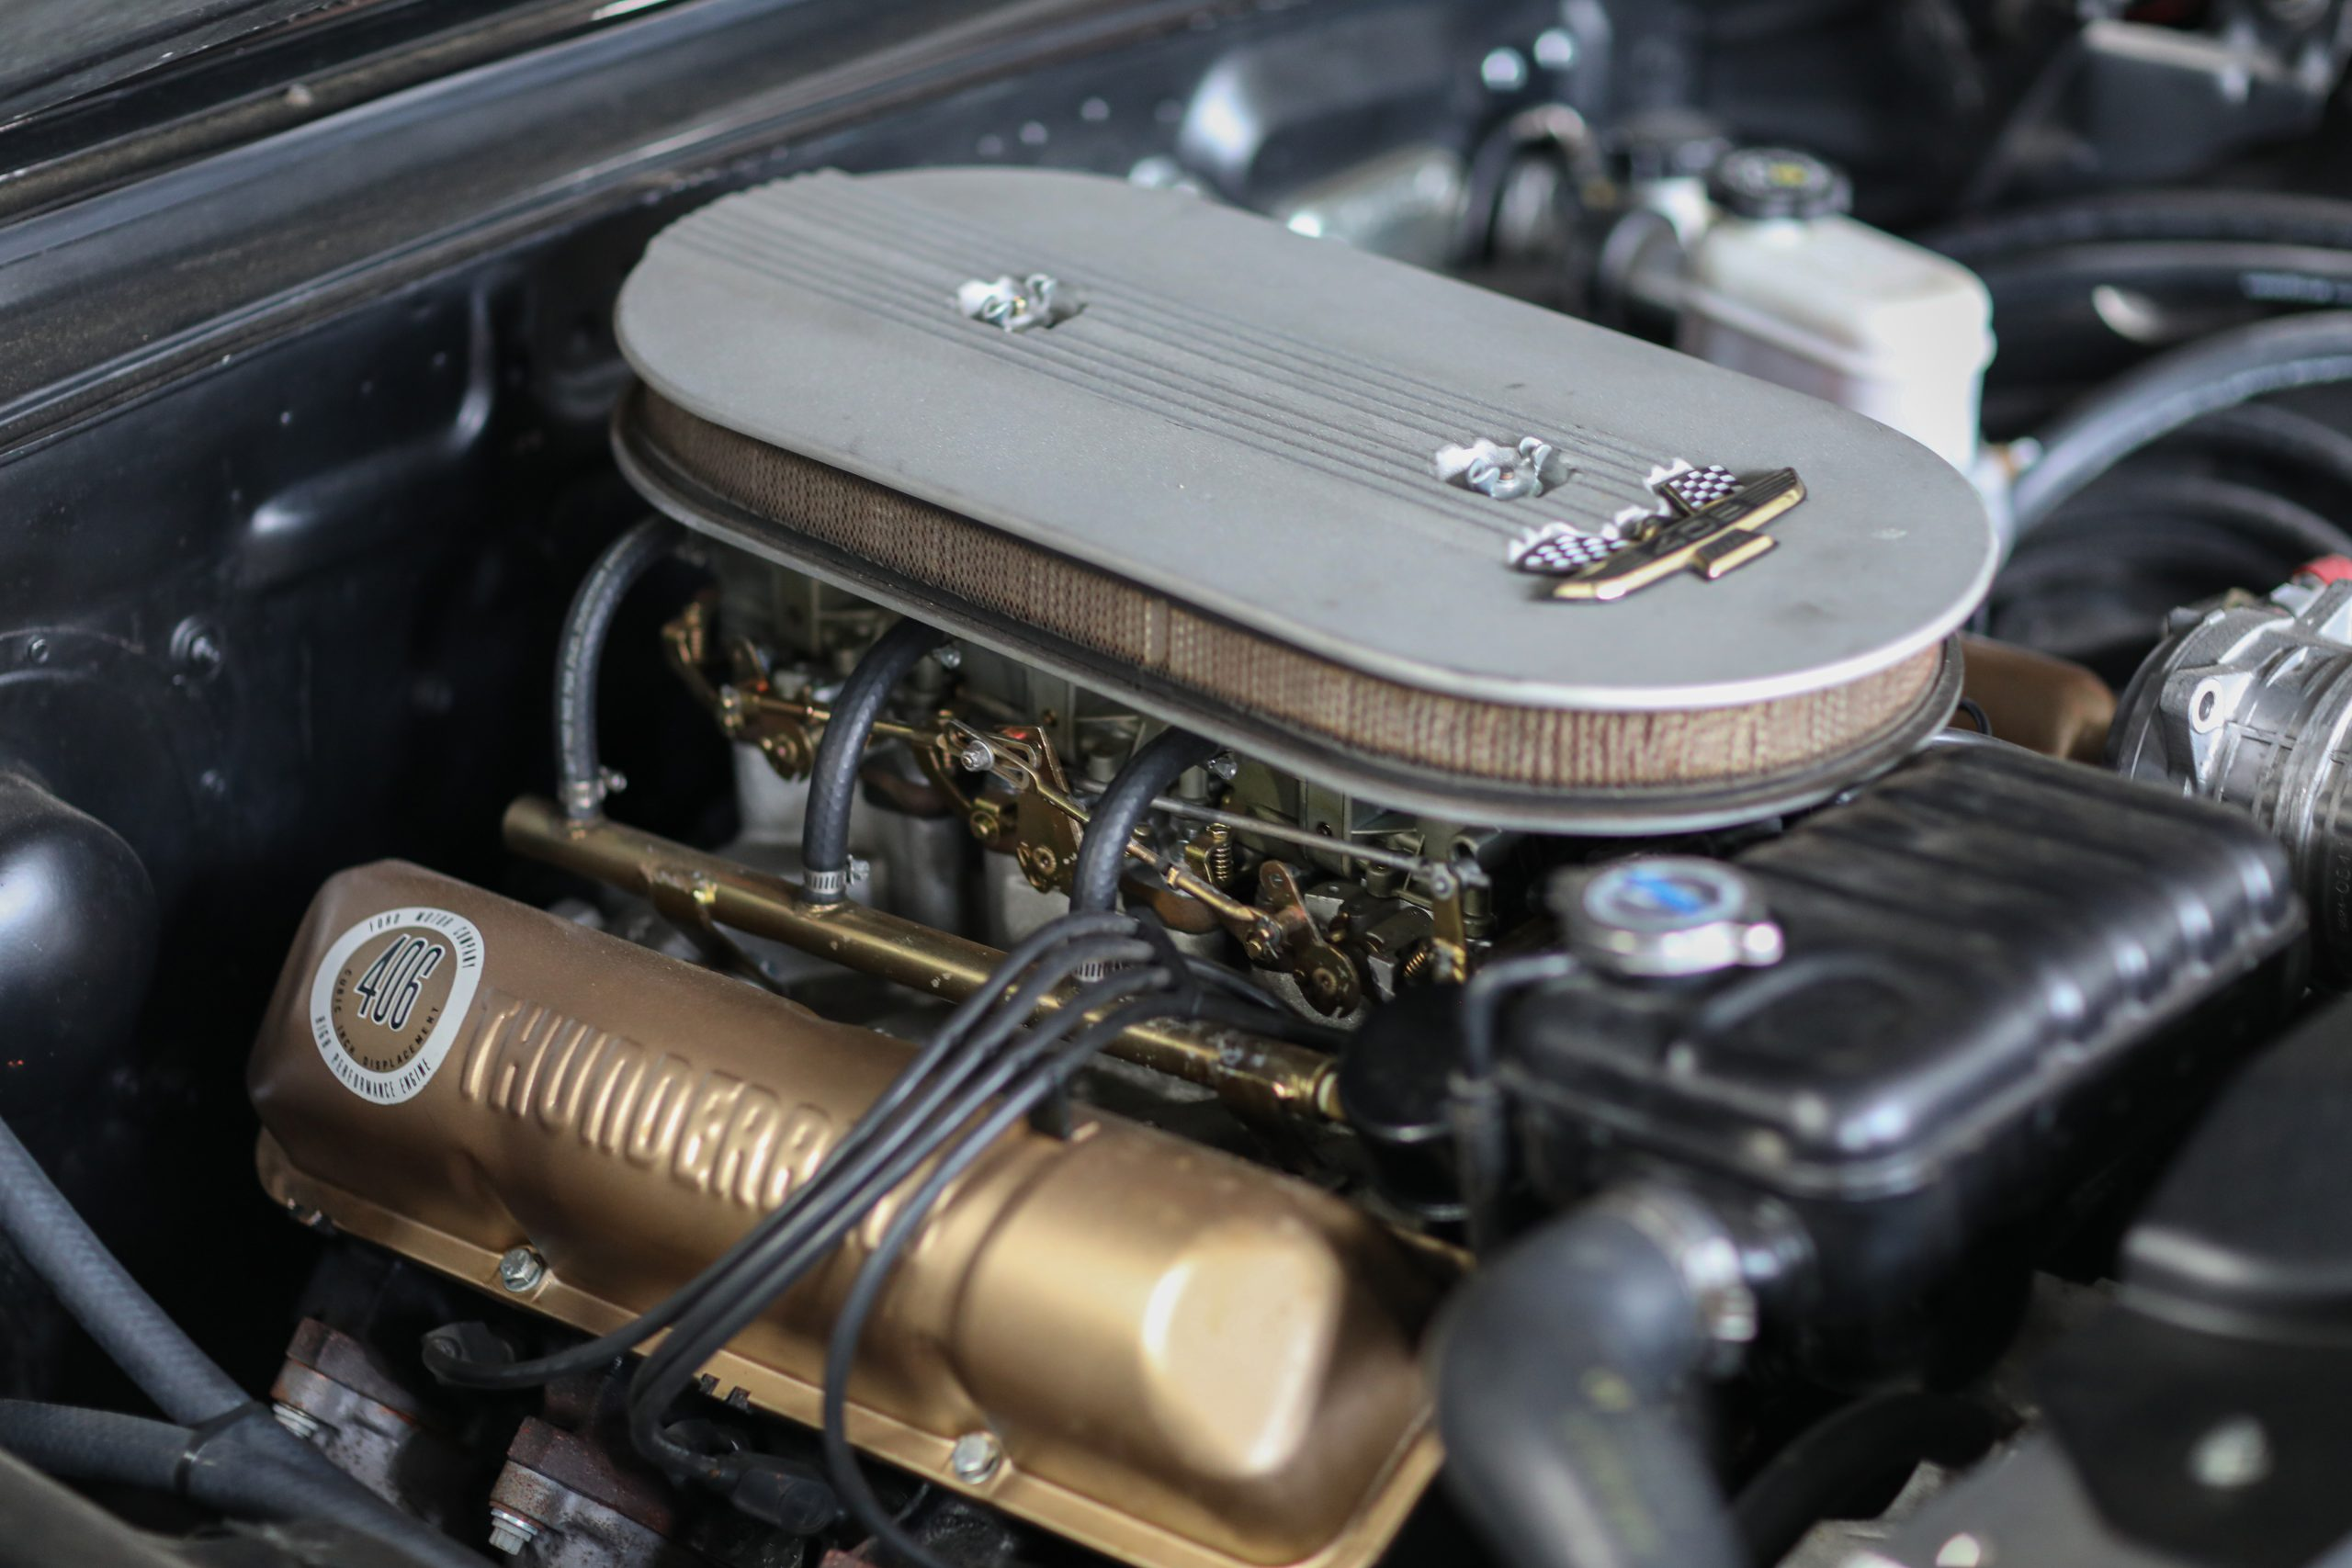 Ford Thunderbird FE V-8 406 engine